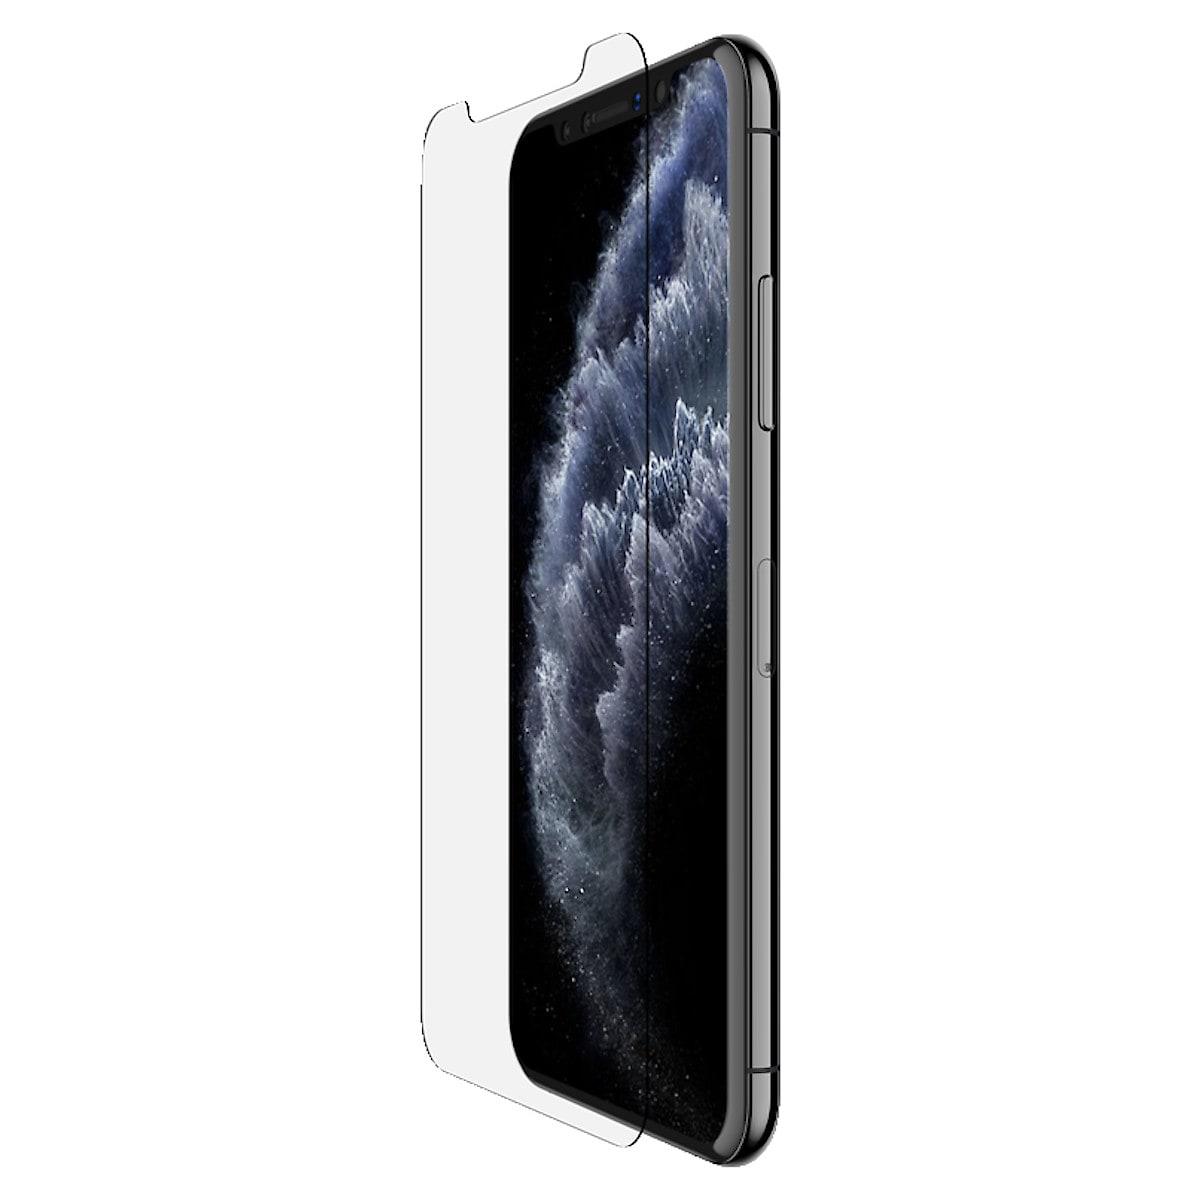 Skärmskydd för iPhone 11 Pro / XS / X Belkin ScreenForce InvisiGlass Ultra